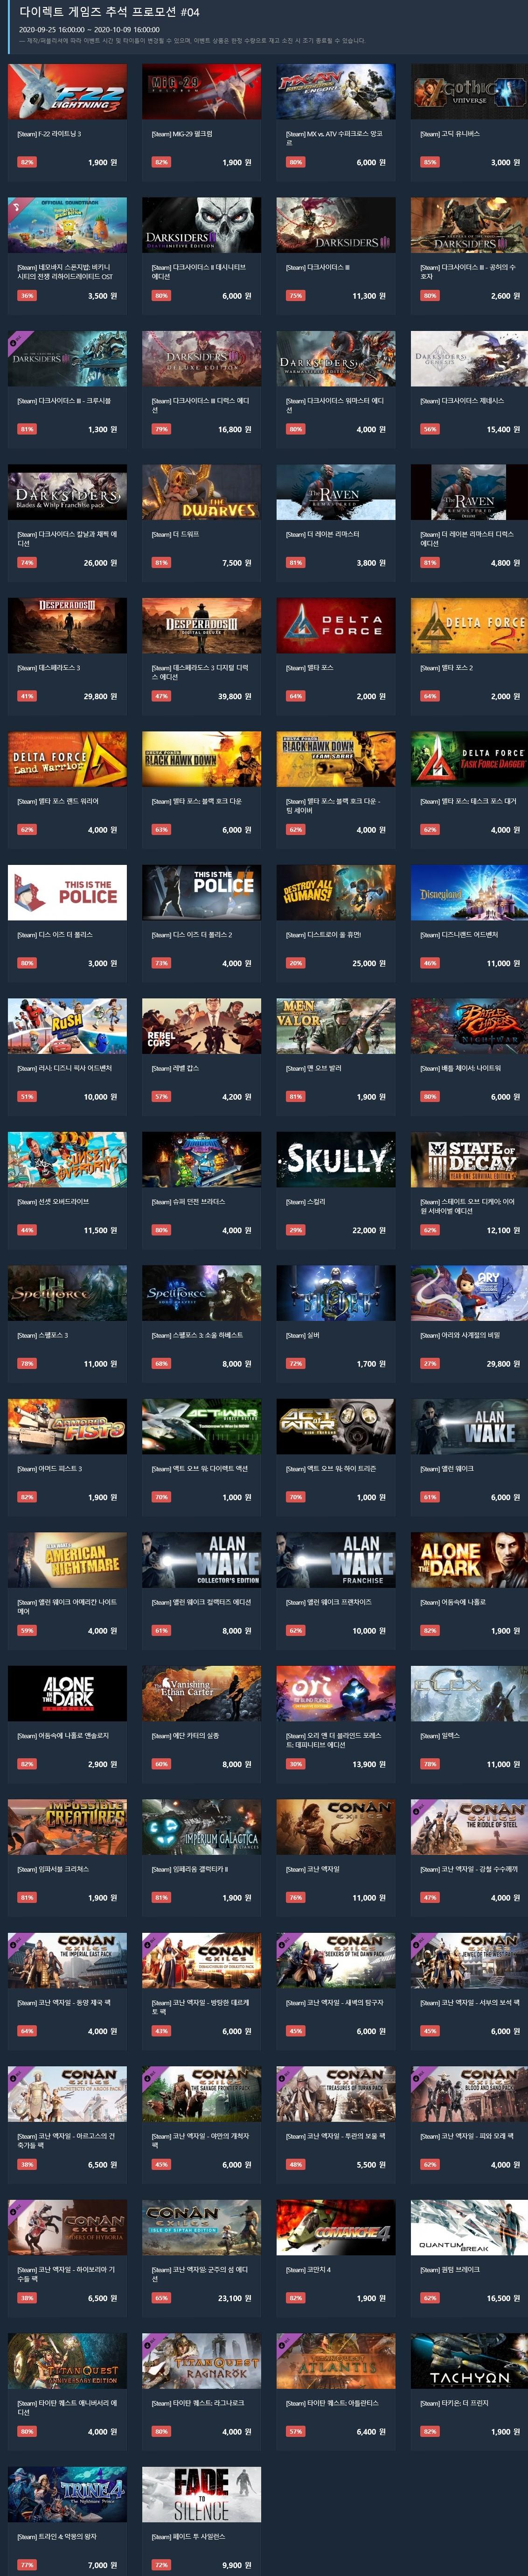 Screenshot_2020-09-25 다이렉트 게임즈 추석 프로모션 #04.jpg